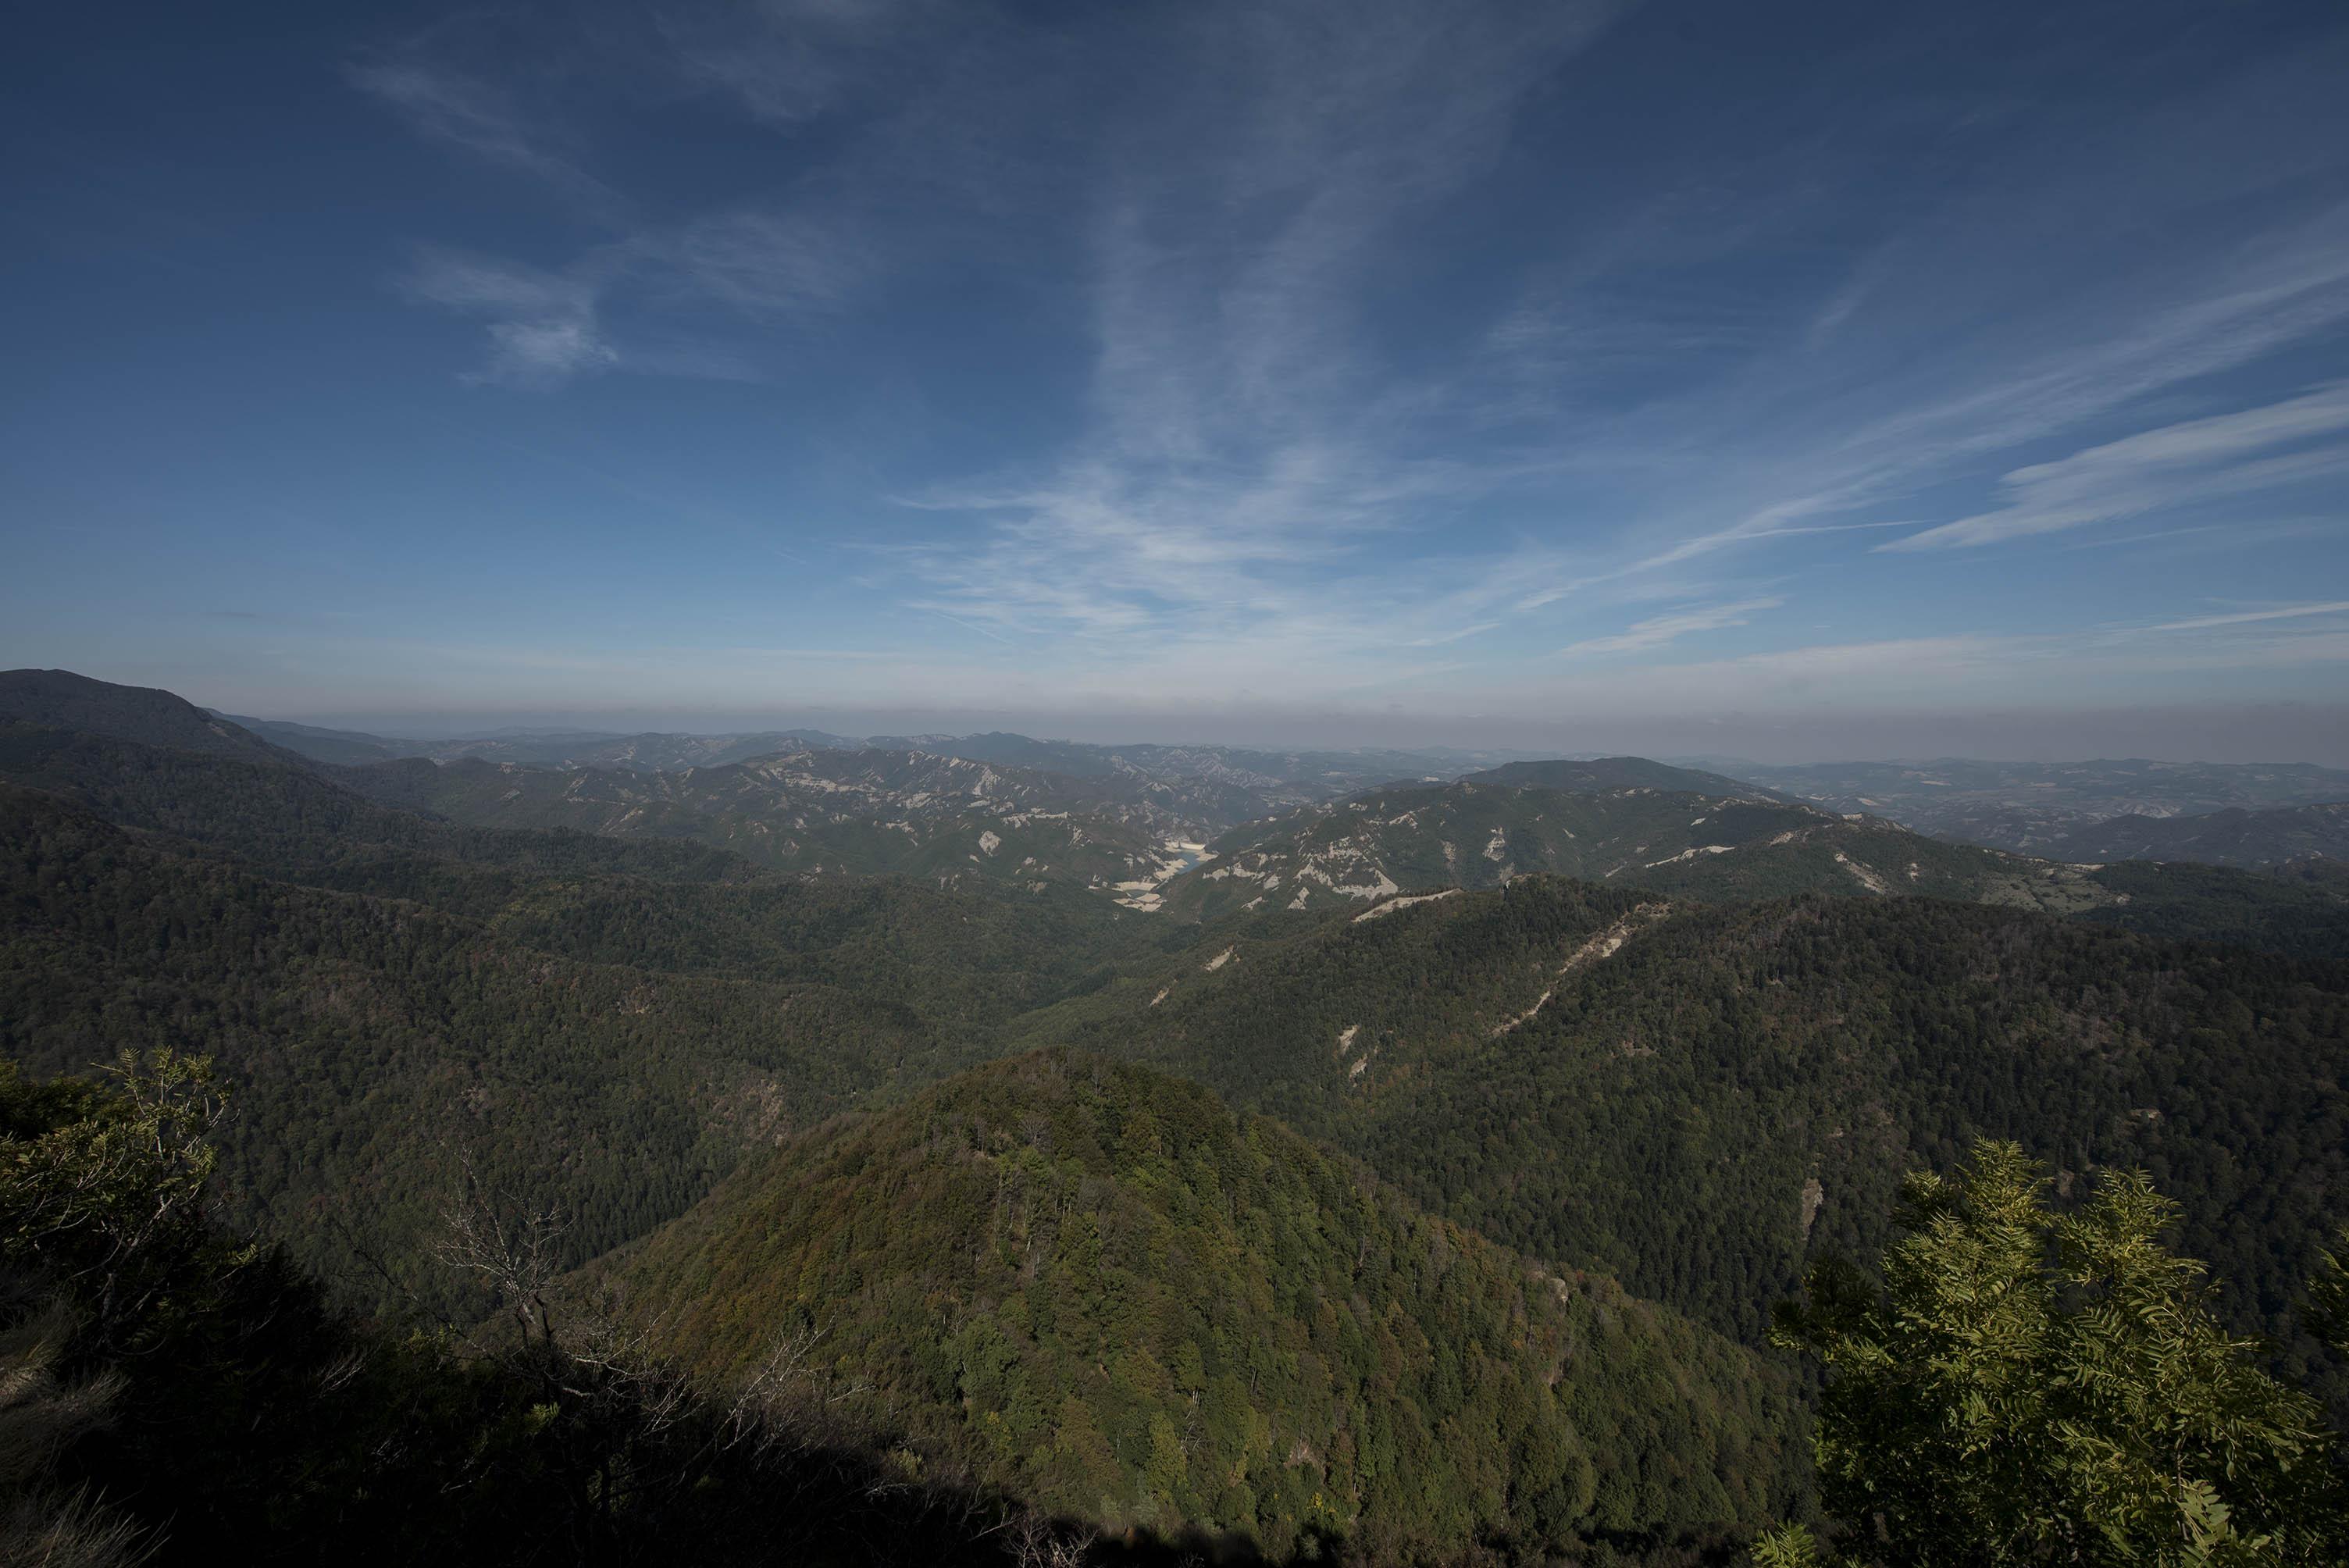 Monte Penna Landscape